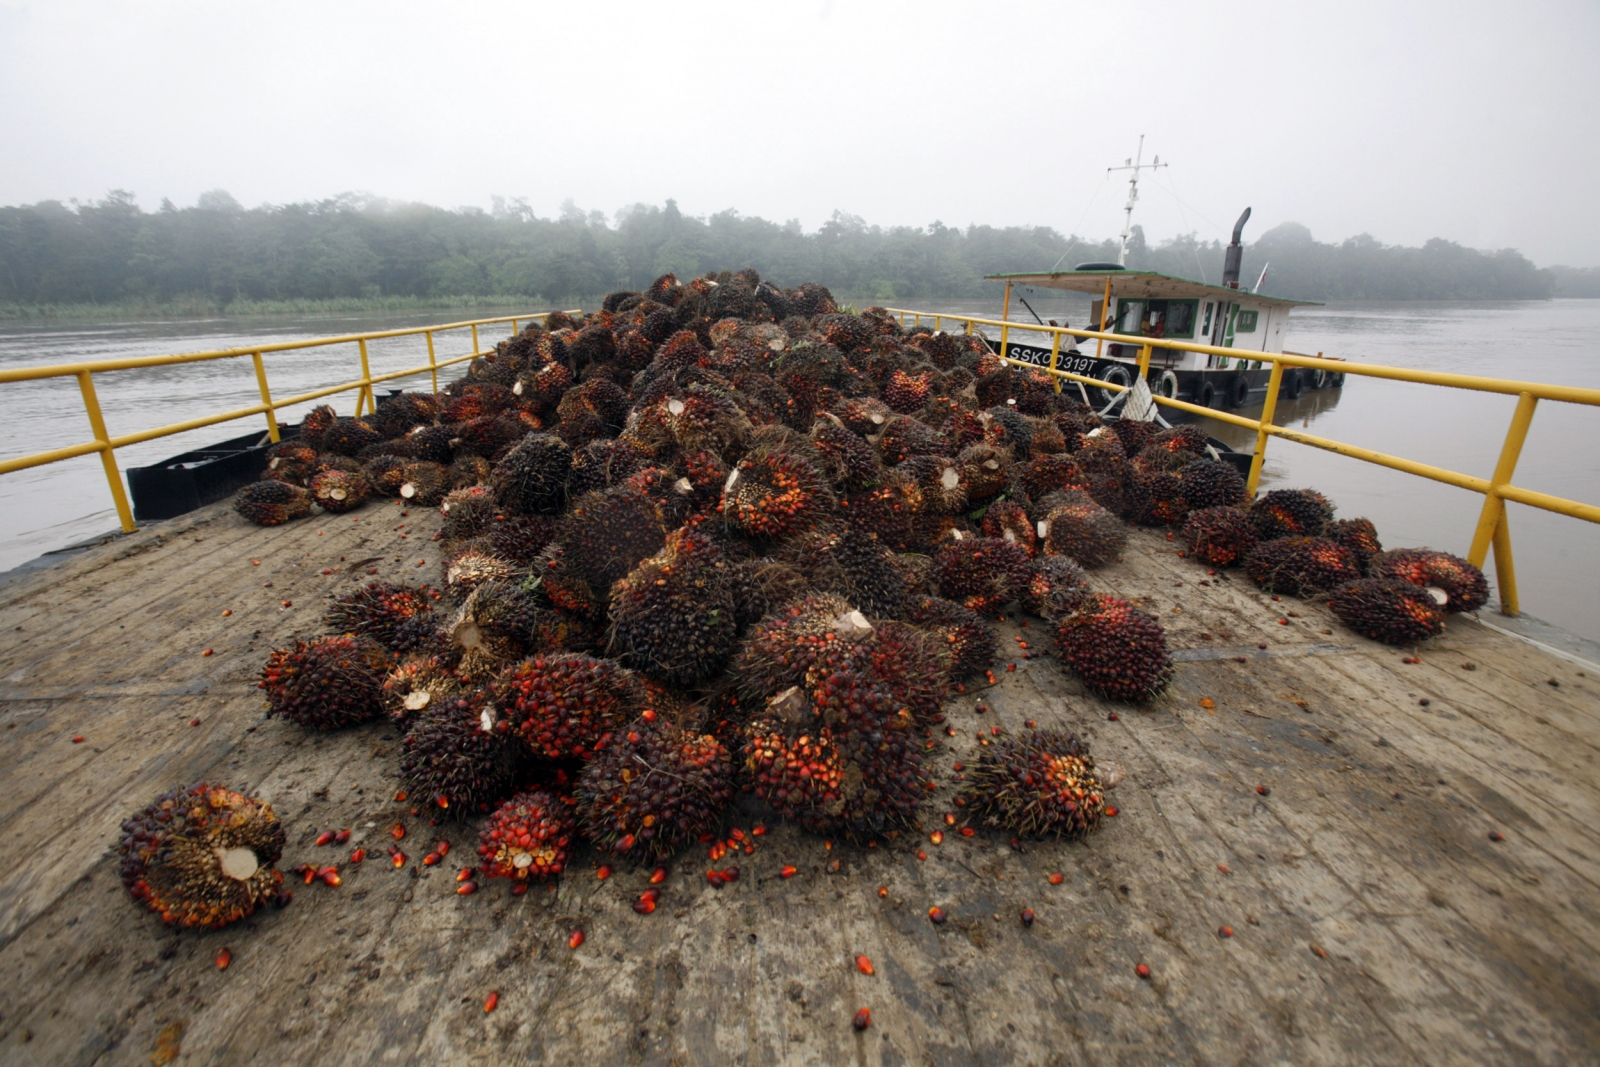 borneo deforestation palm oil